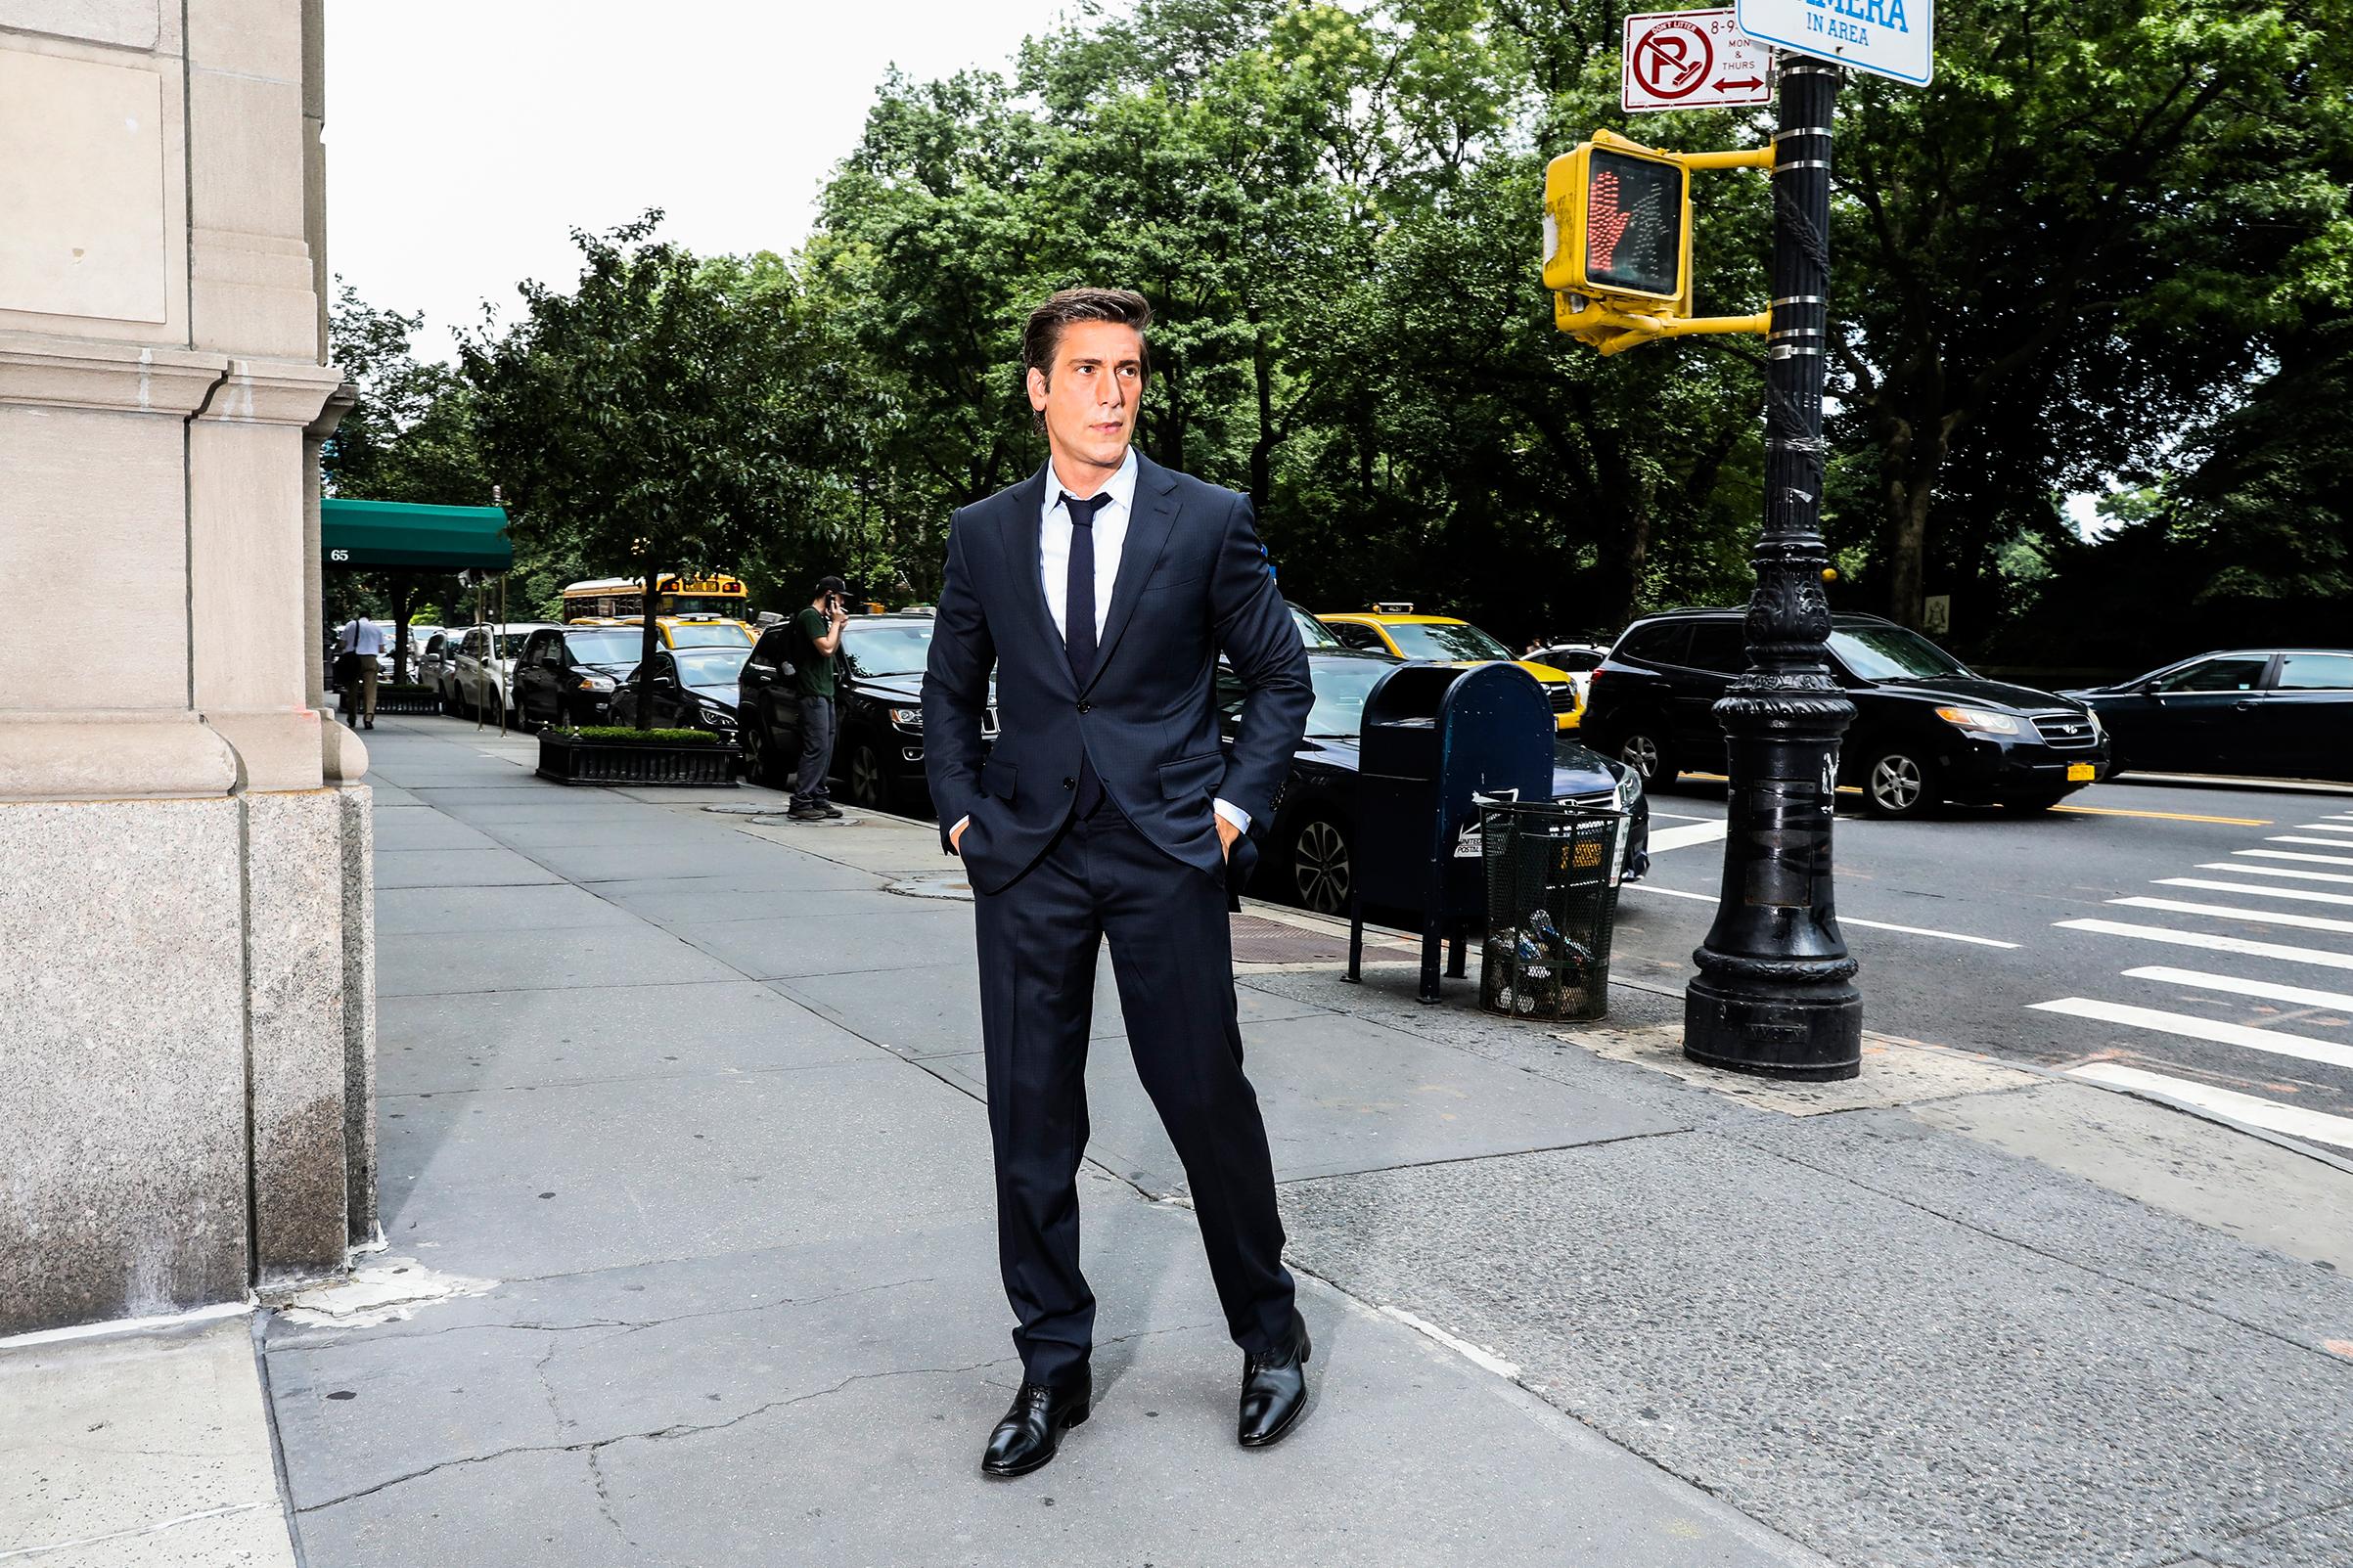 ABC World News Tonight anchor David Muir in Manhattan on Aug. 7, 2018.